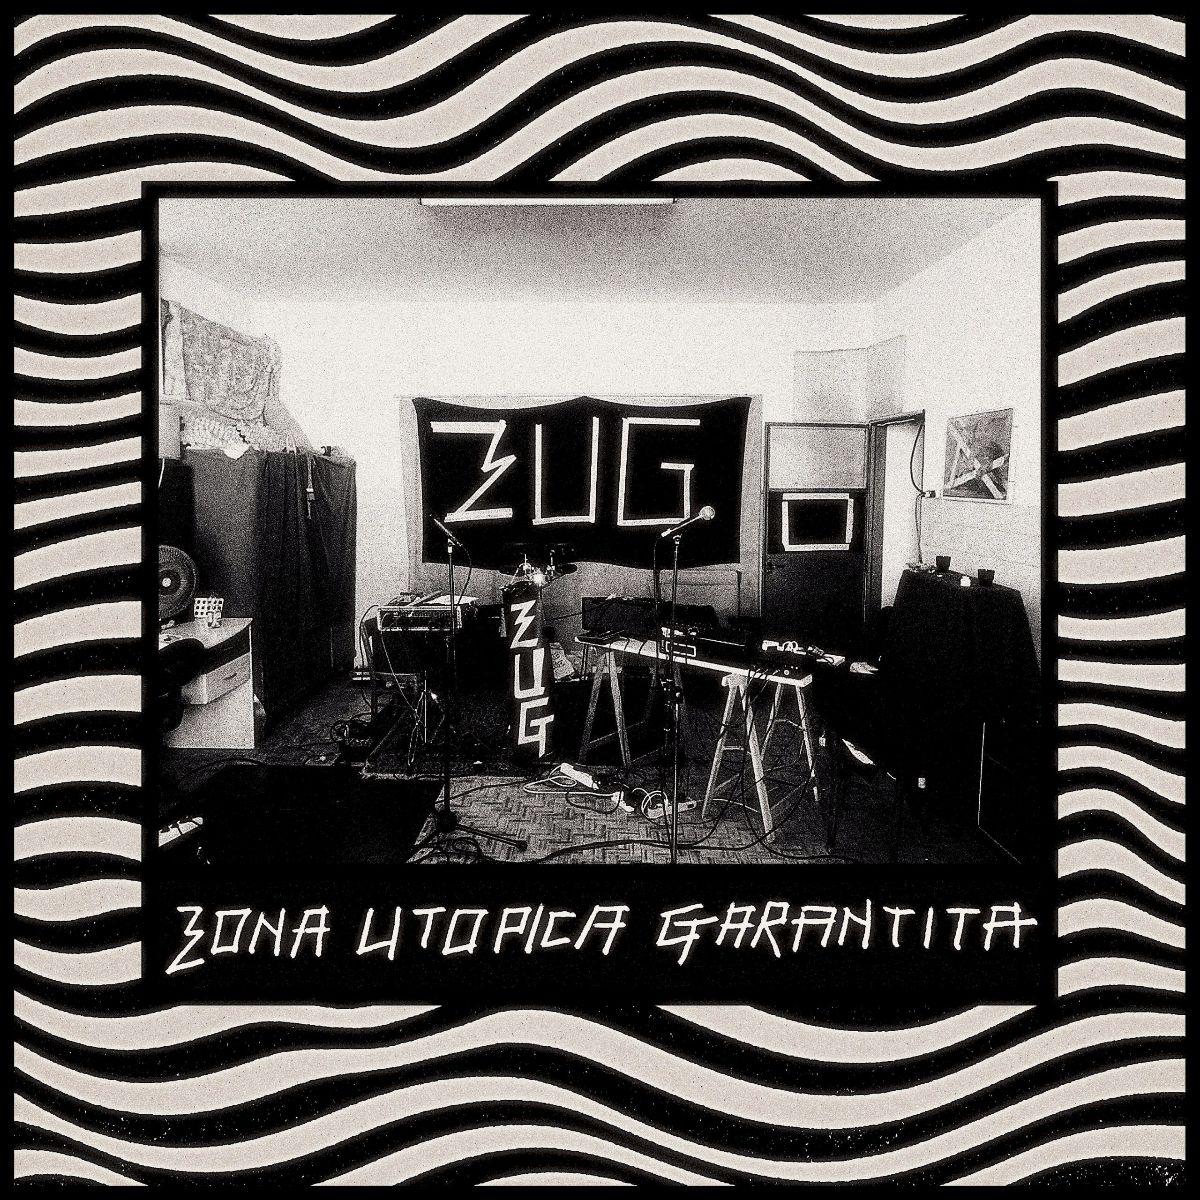 Zona Utopica Garantita - Zug!, Zug!, Zug!